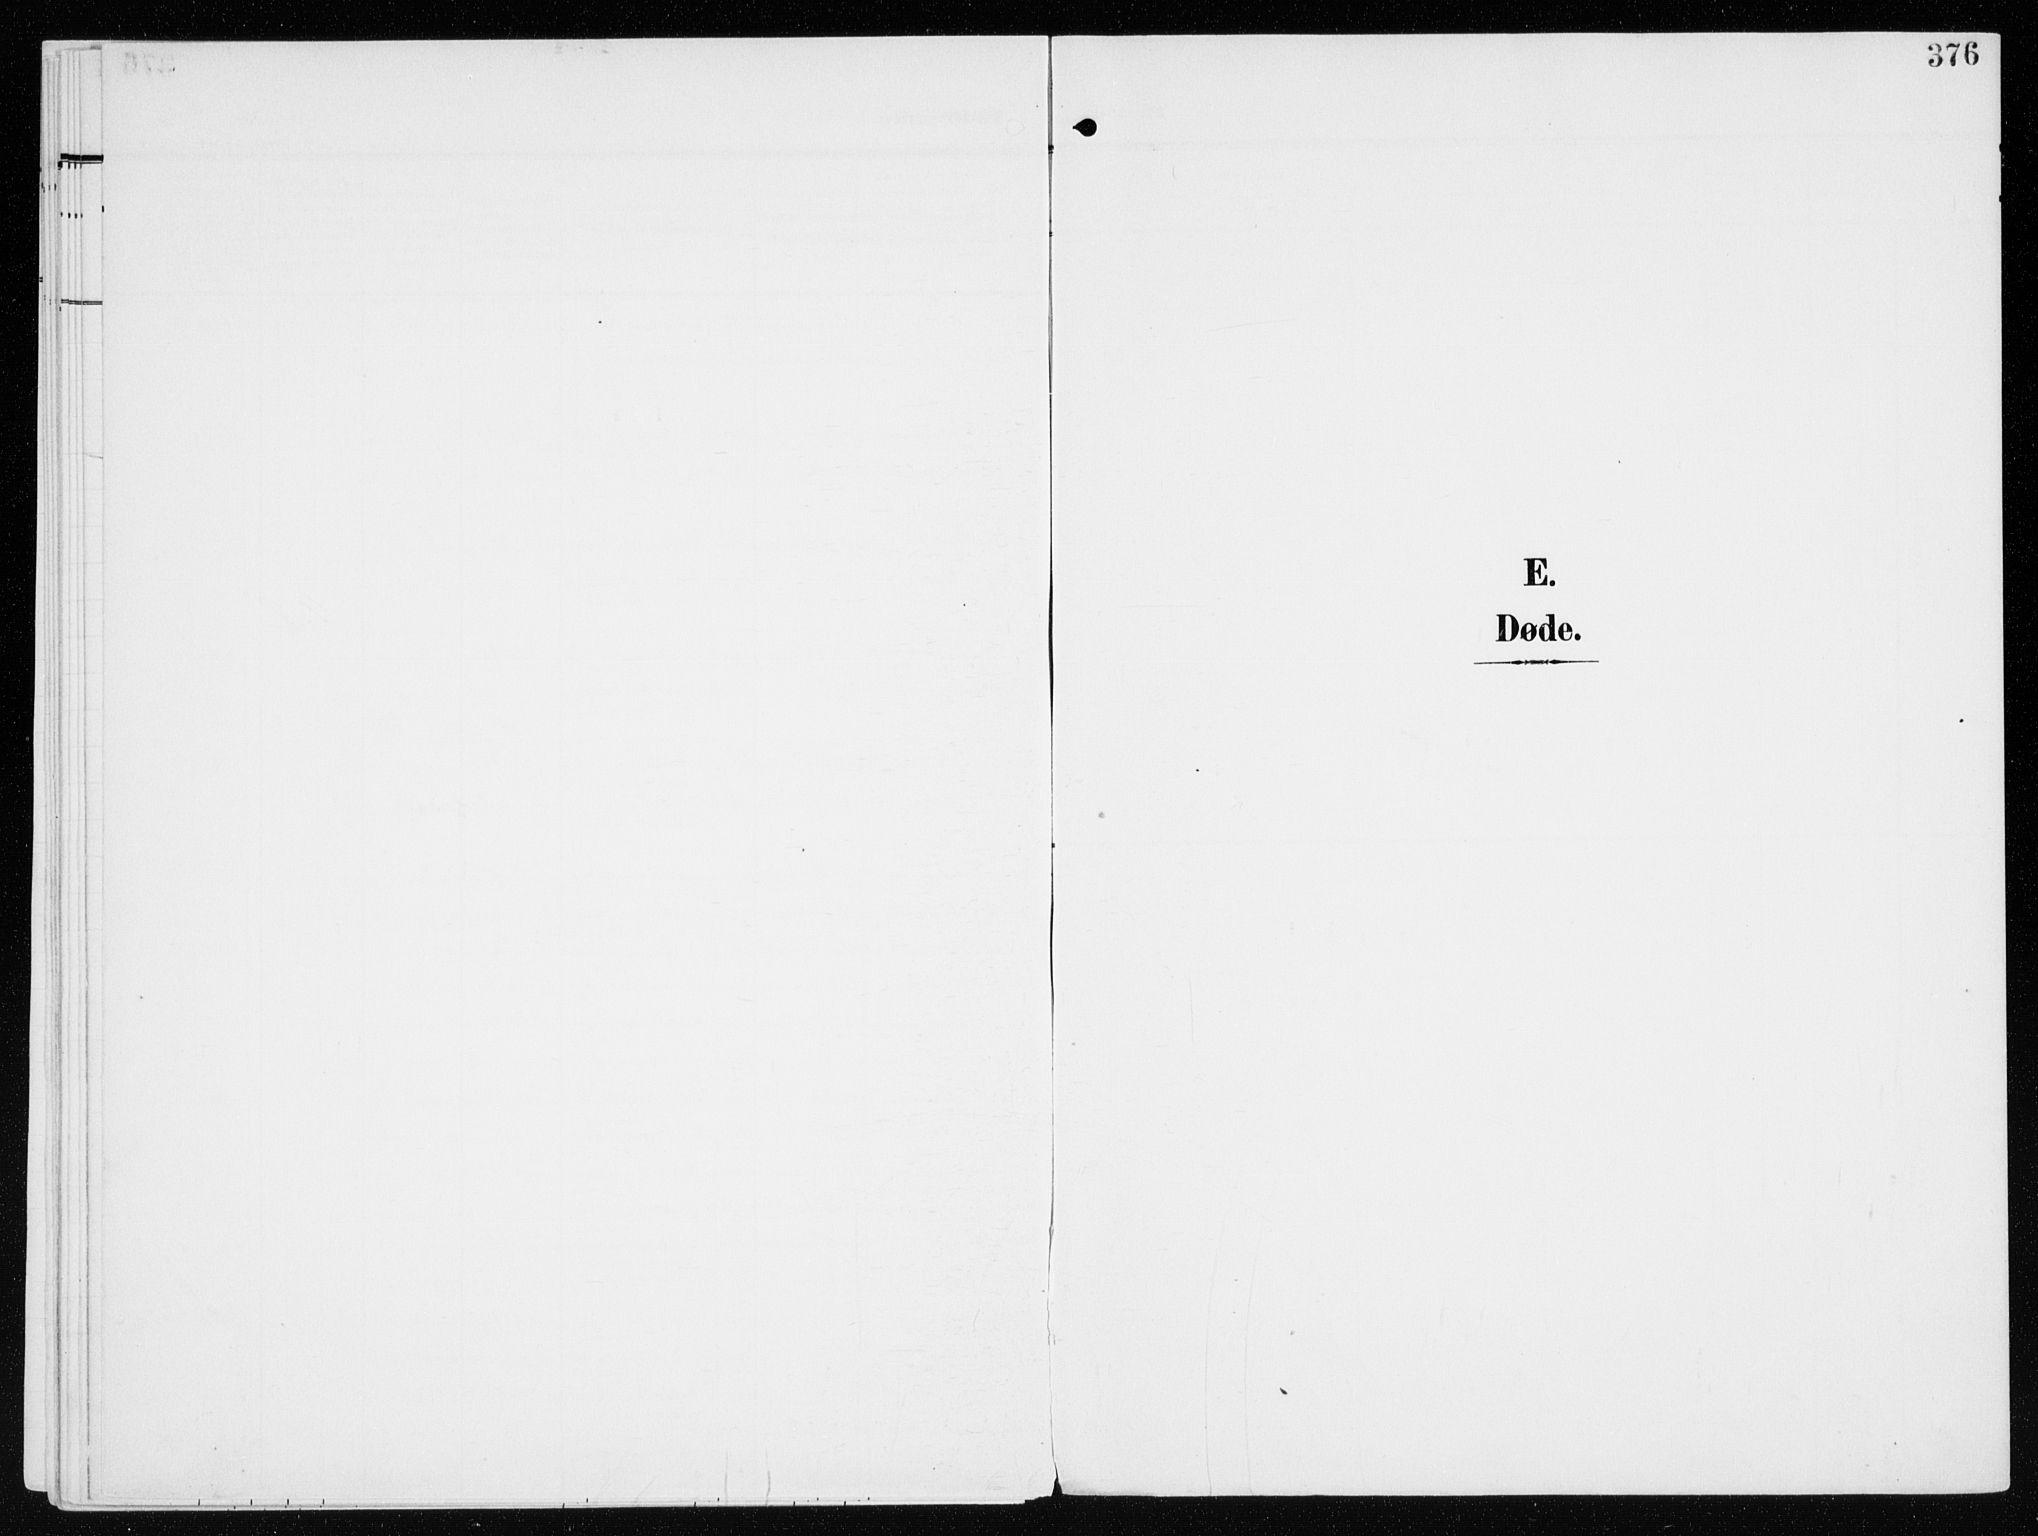 SAH, Furnes prestekontor, K/Ka/L0001: Ministerialbok nr. 1, 1907-1935, s. 376